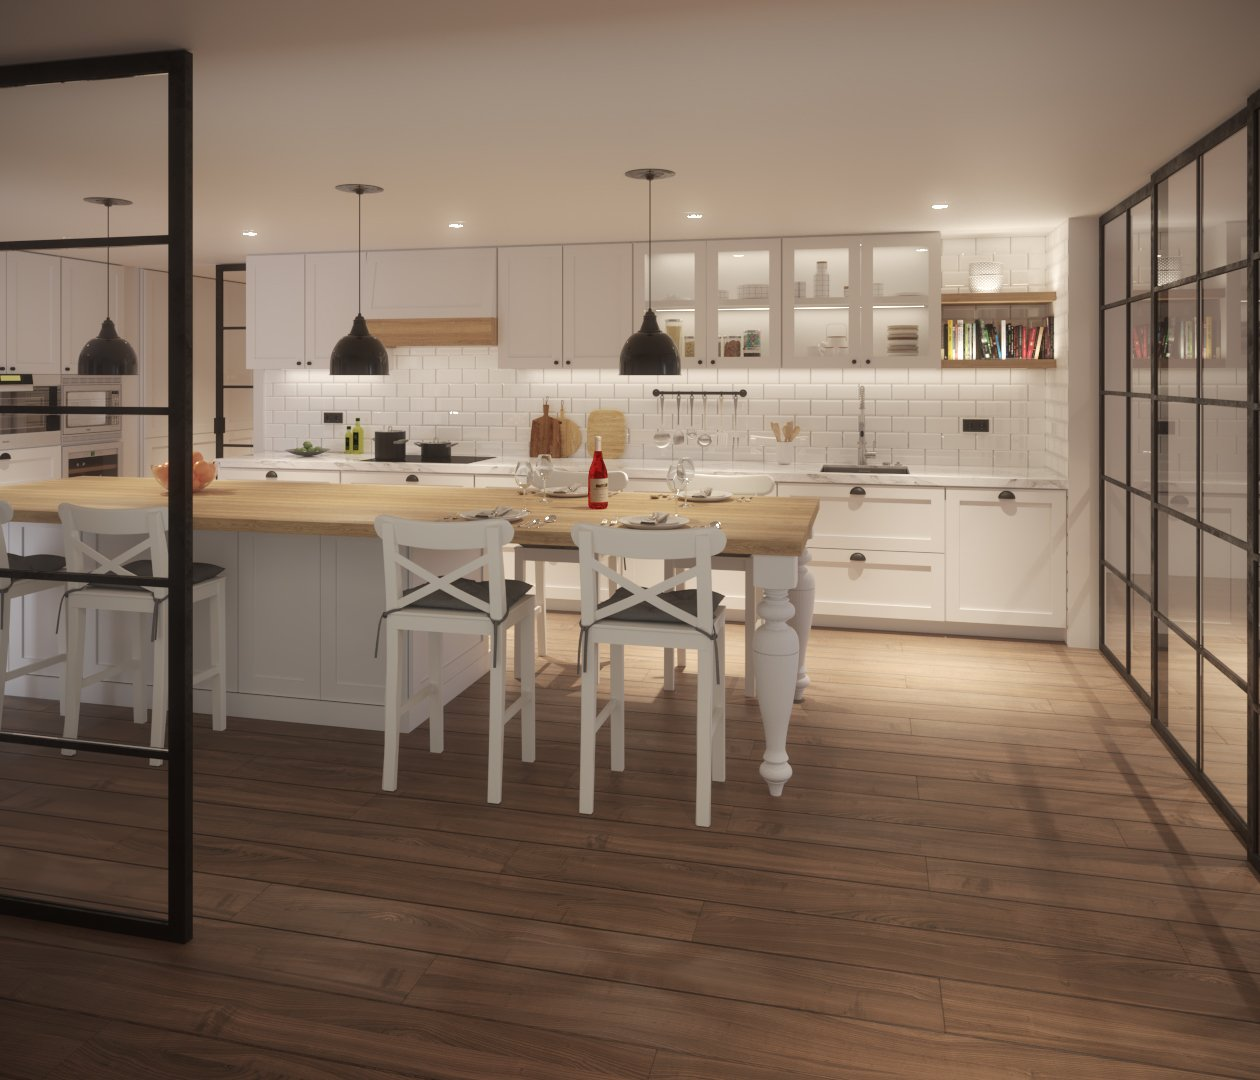 cuina-mobles-alts-d6ca22e90196f37f3742e84b81c49c5b